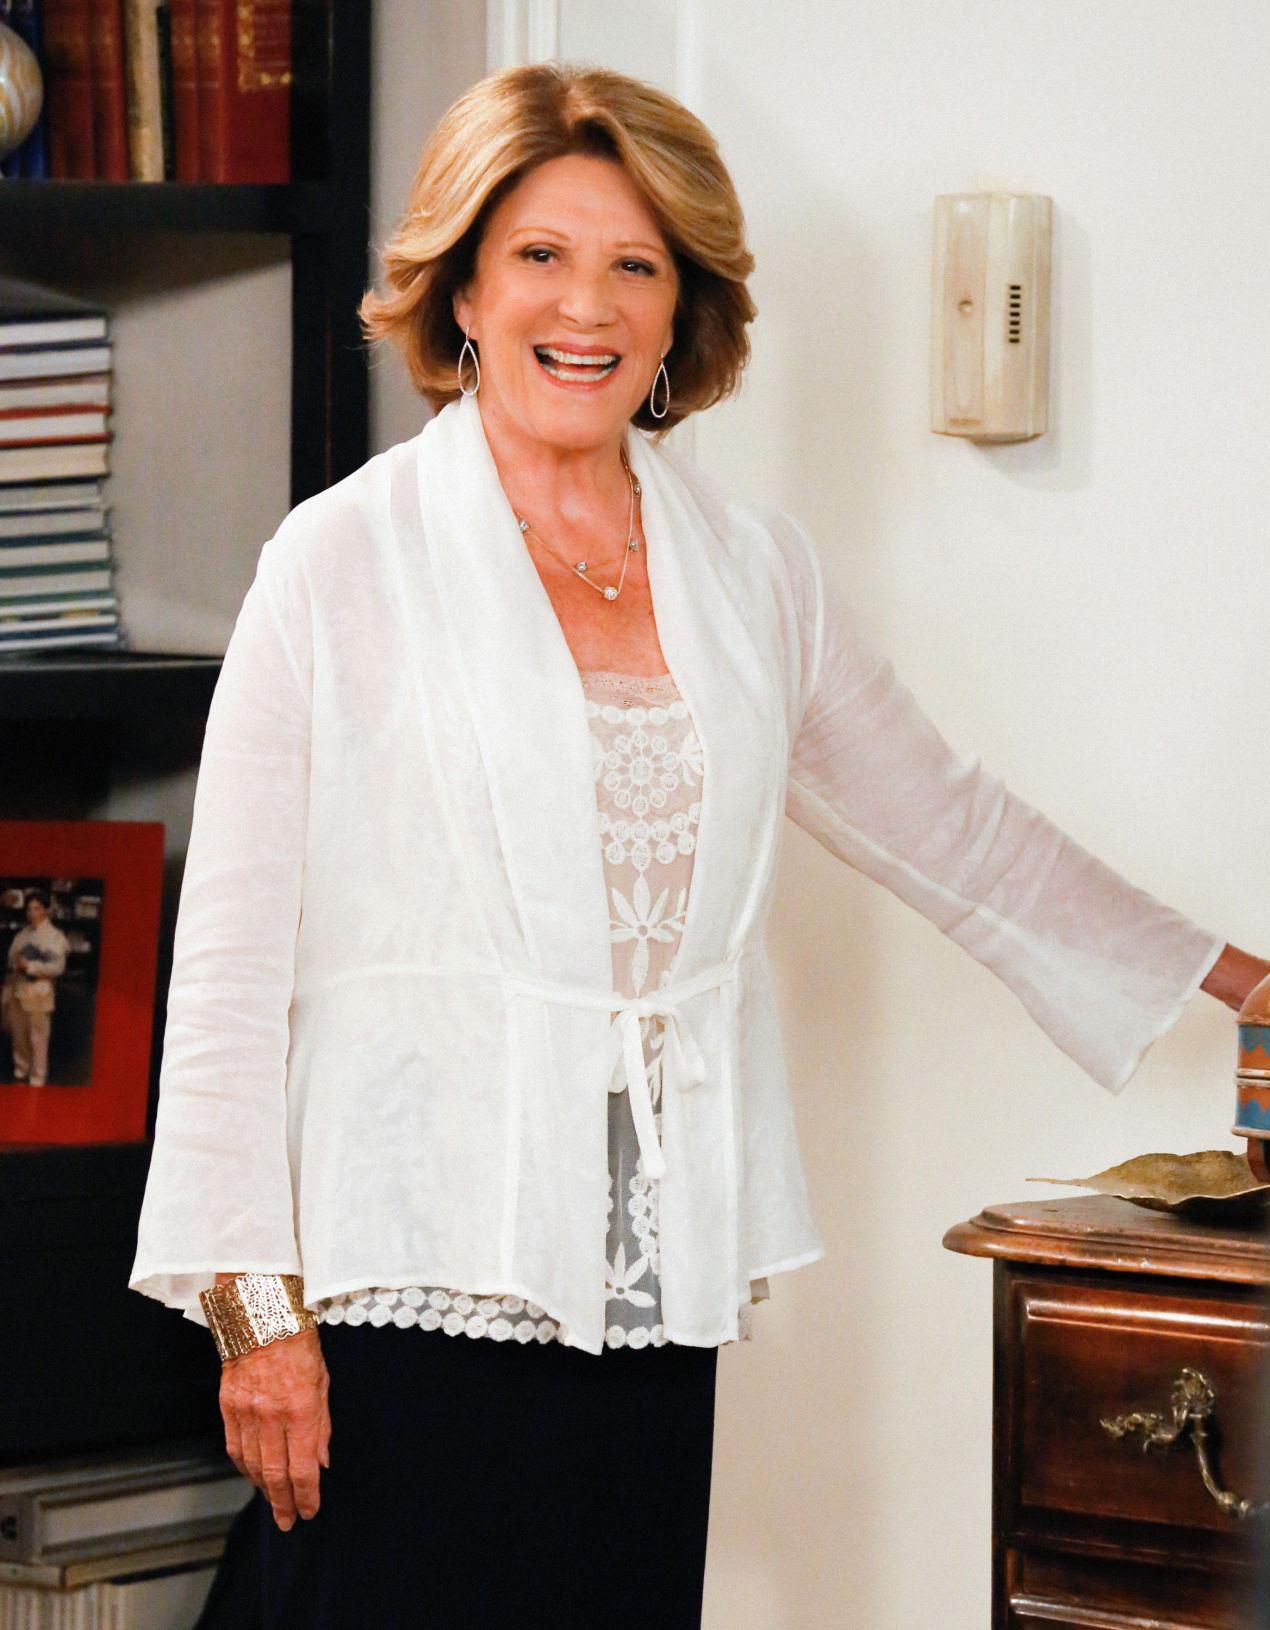 Silvia Dionisio (born 1951) forecasting